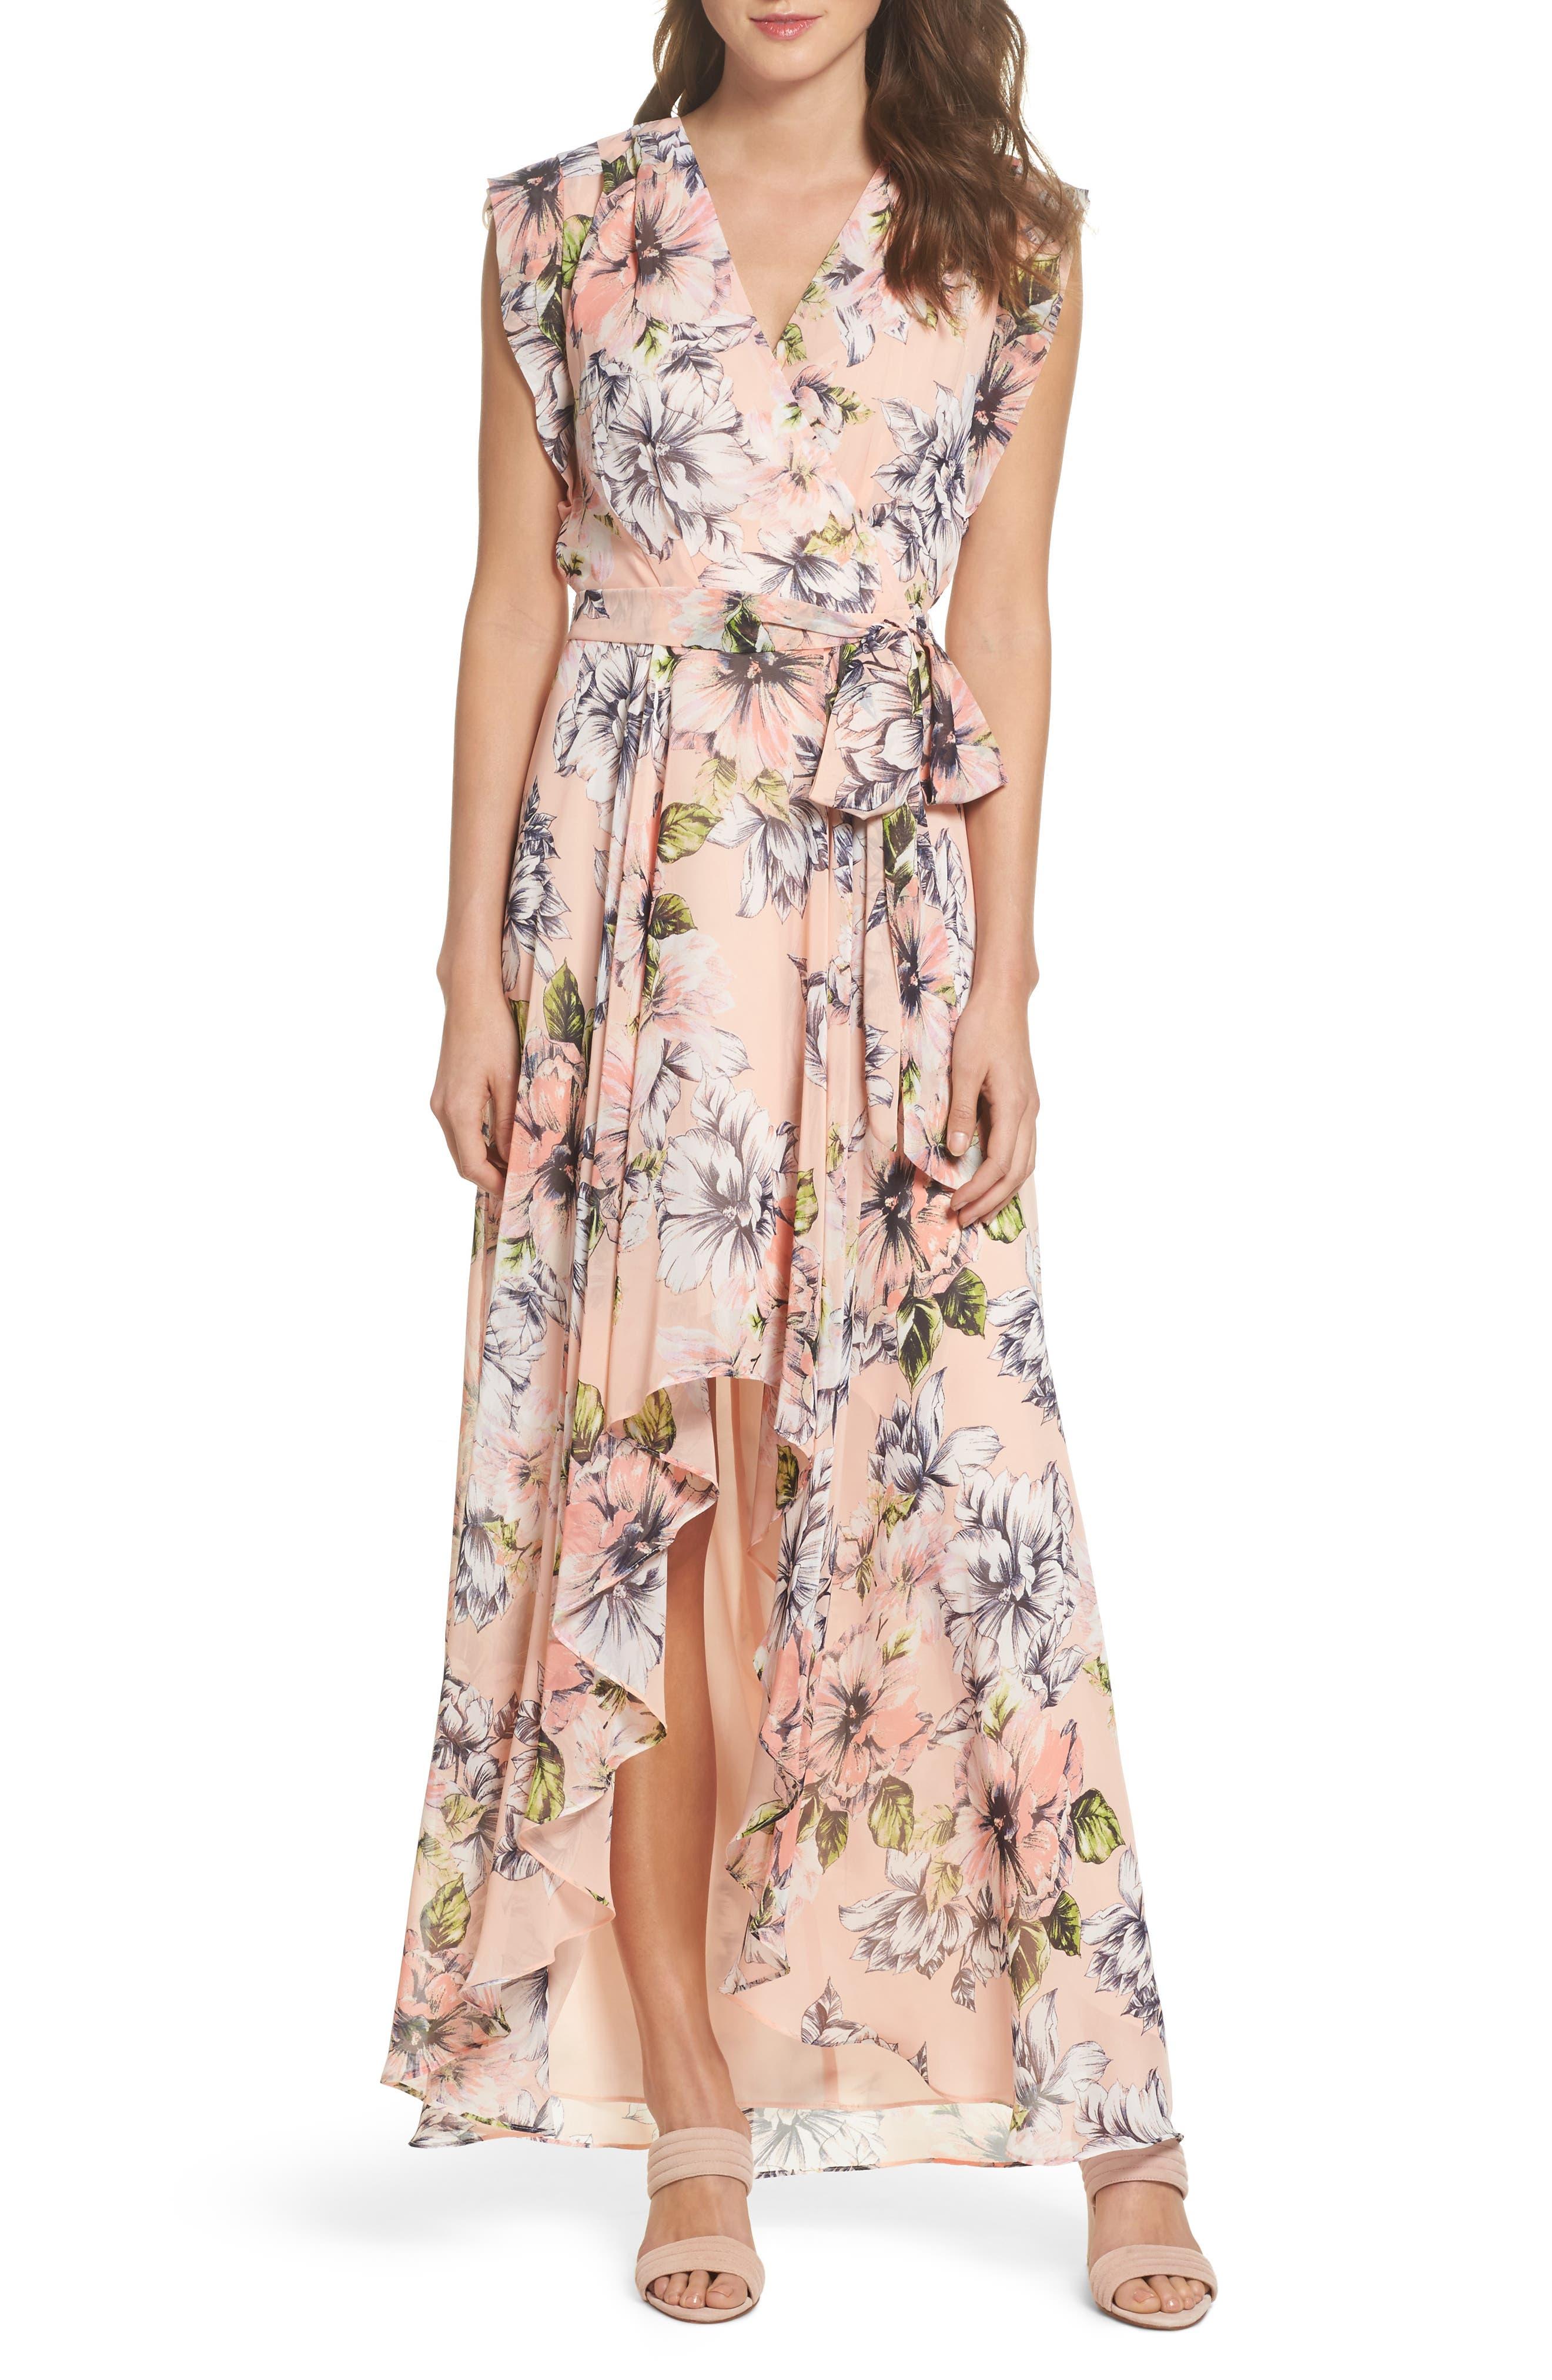 ELIZA J, Floral Ruffle High/Low Maxi Dress, Main thumbnail 1, color, BLUSH